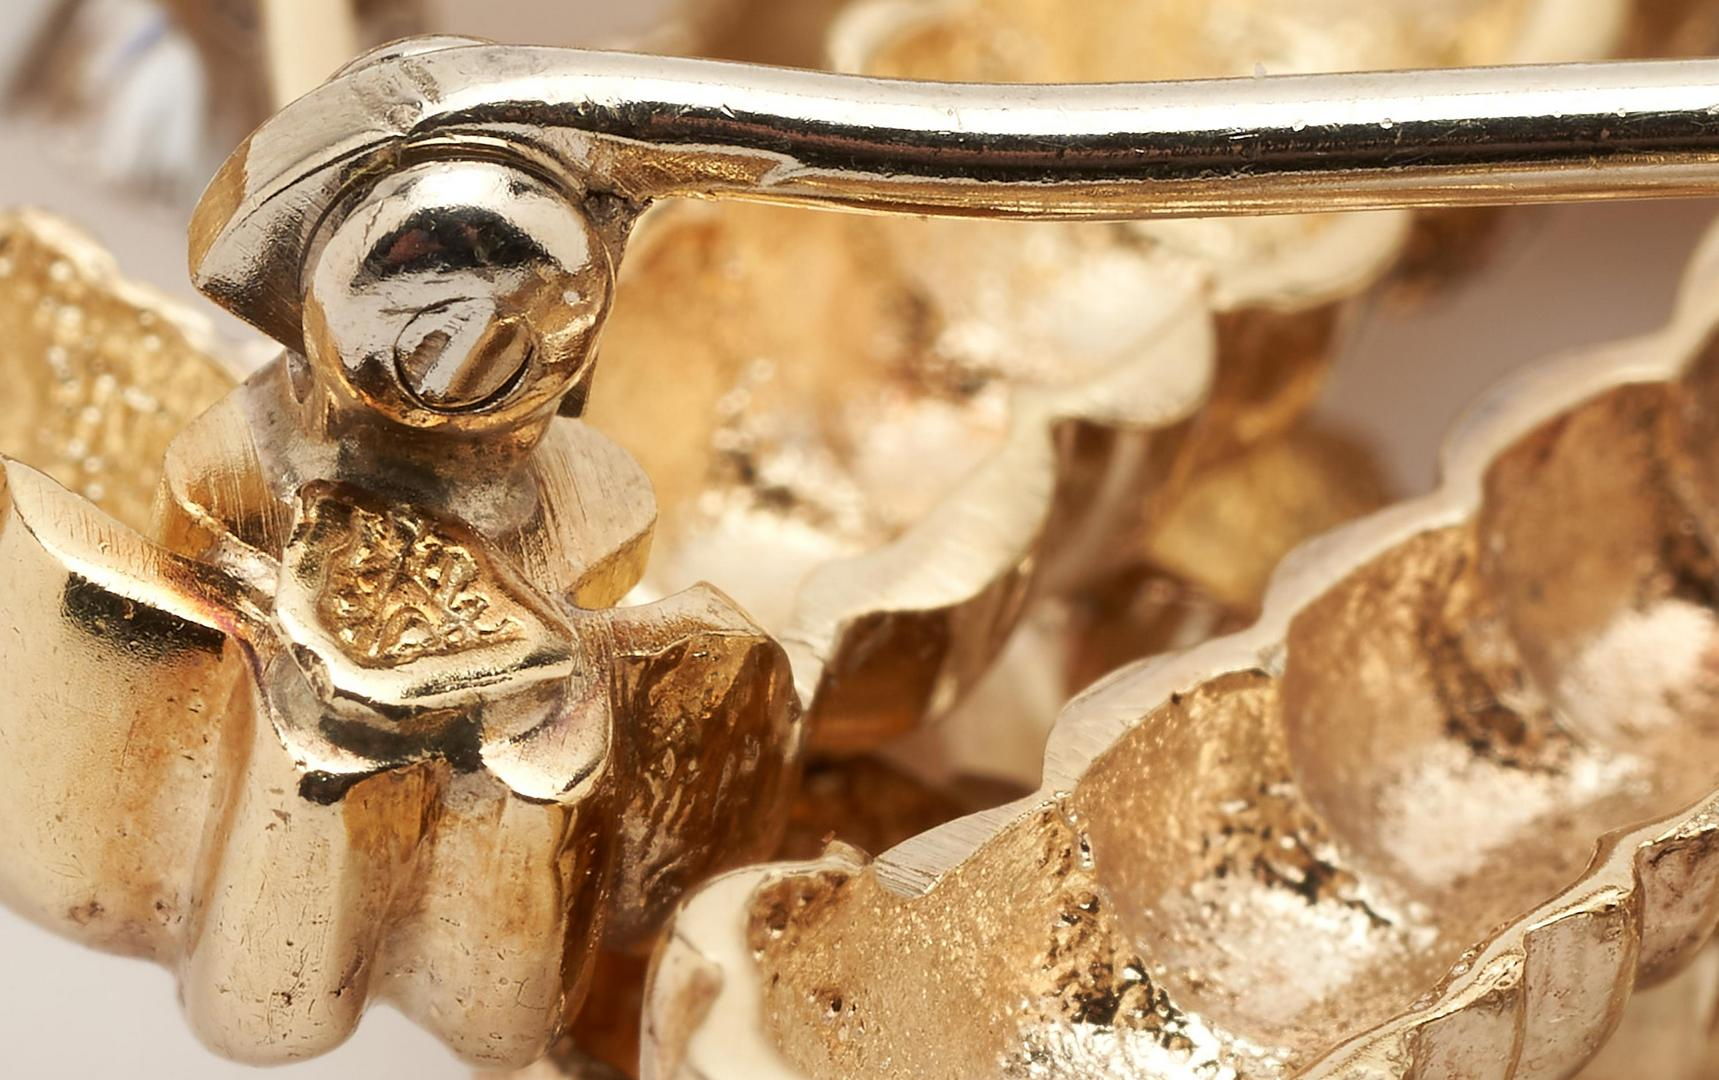 Lot 257: Ladies 14K Gold & Diamond Brooch/Pendant